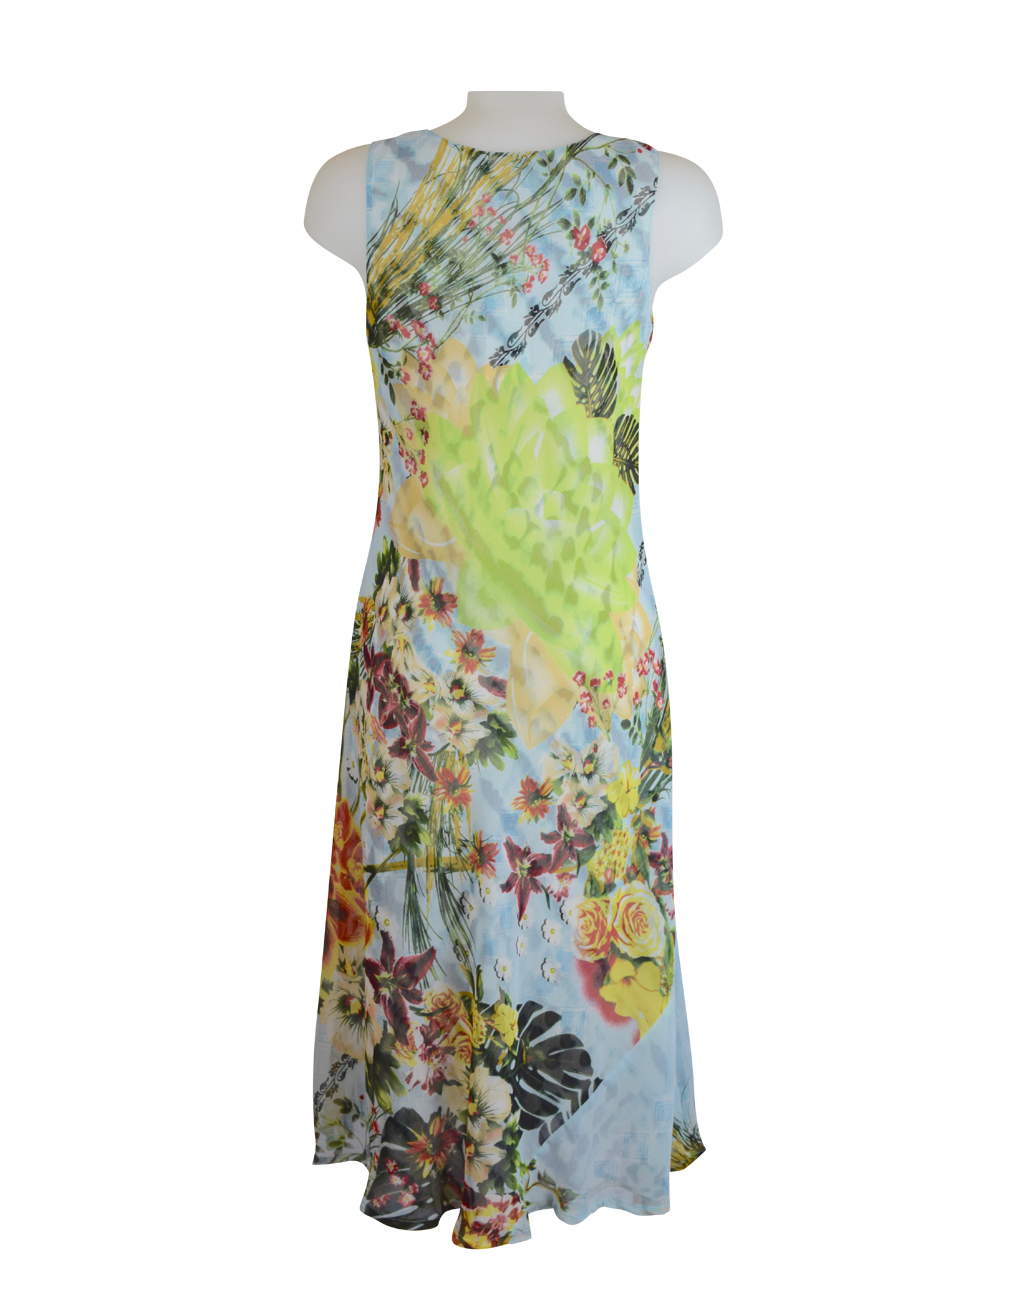 Paramour Reversible 2 In 1 Sleeveless Dress Orange Floral / Snake Print C1